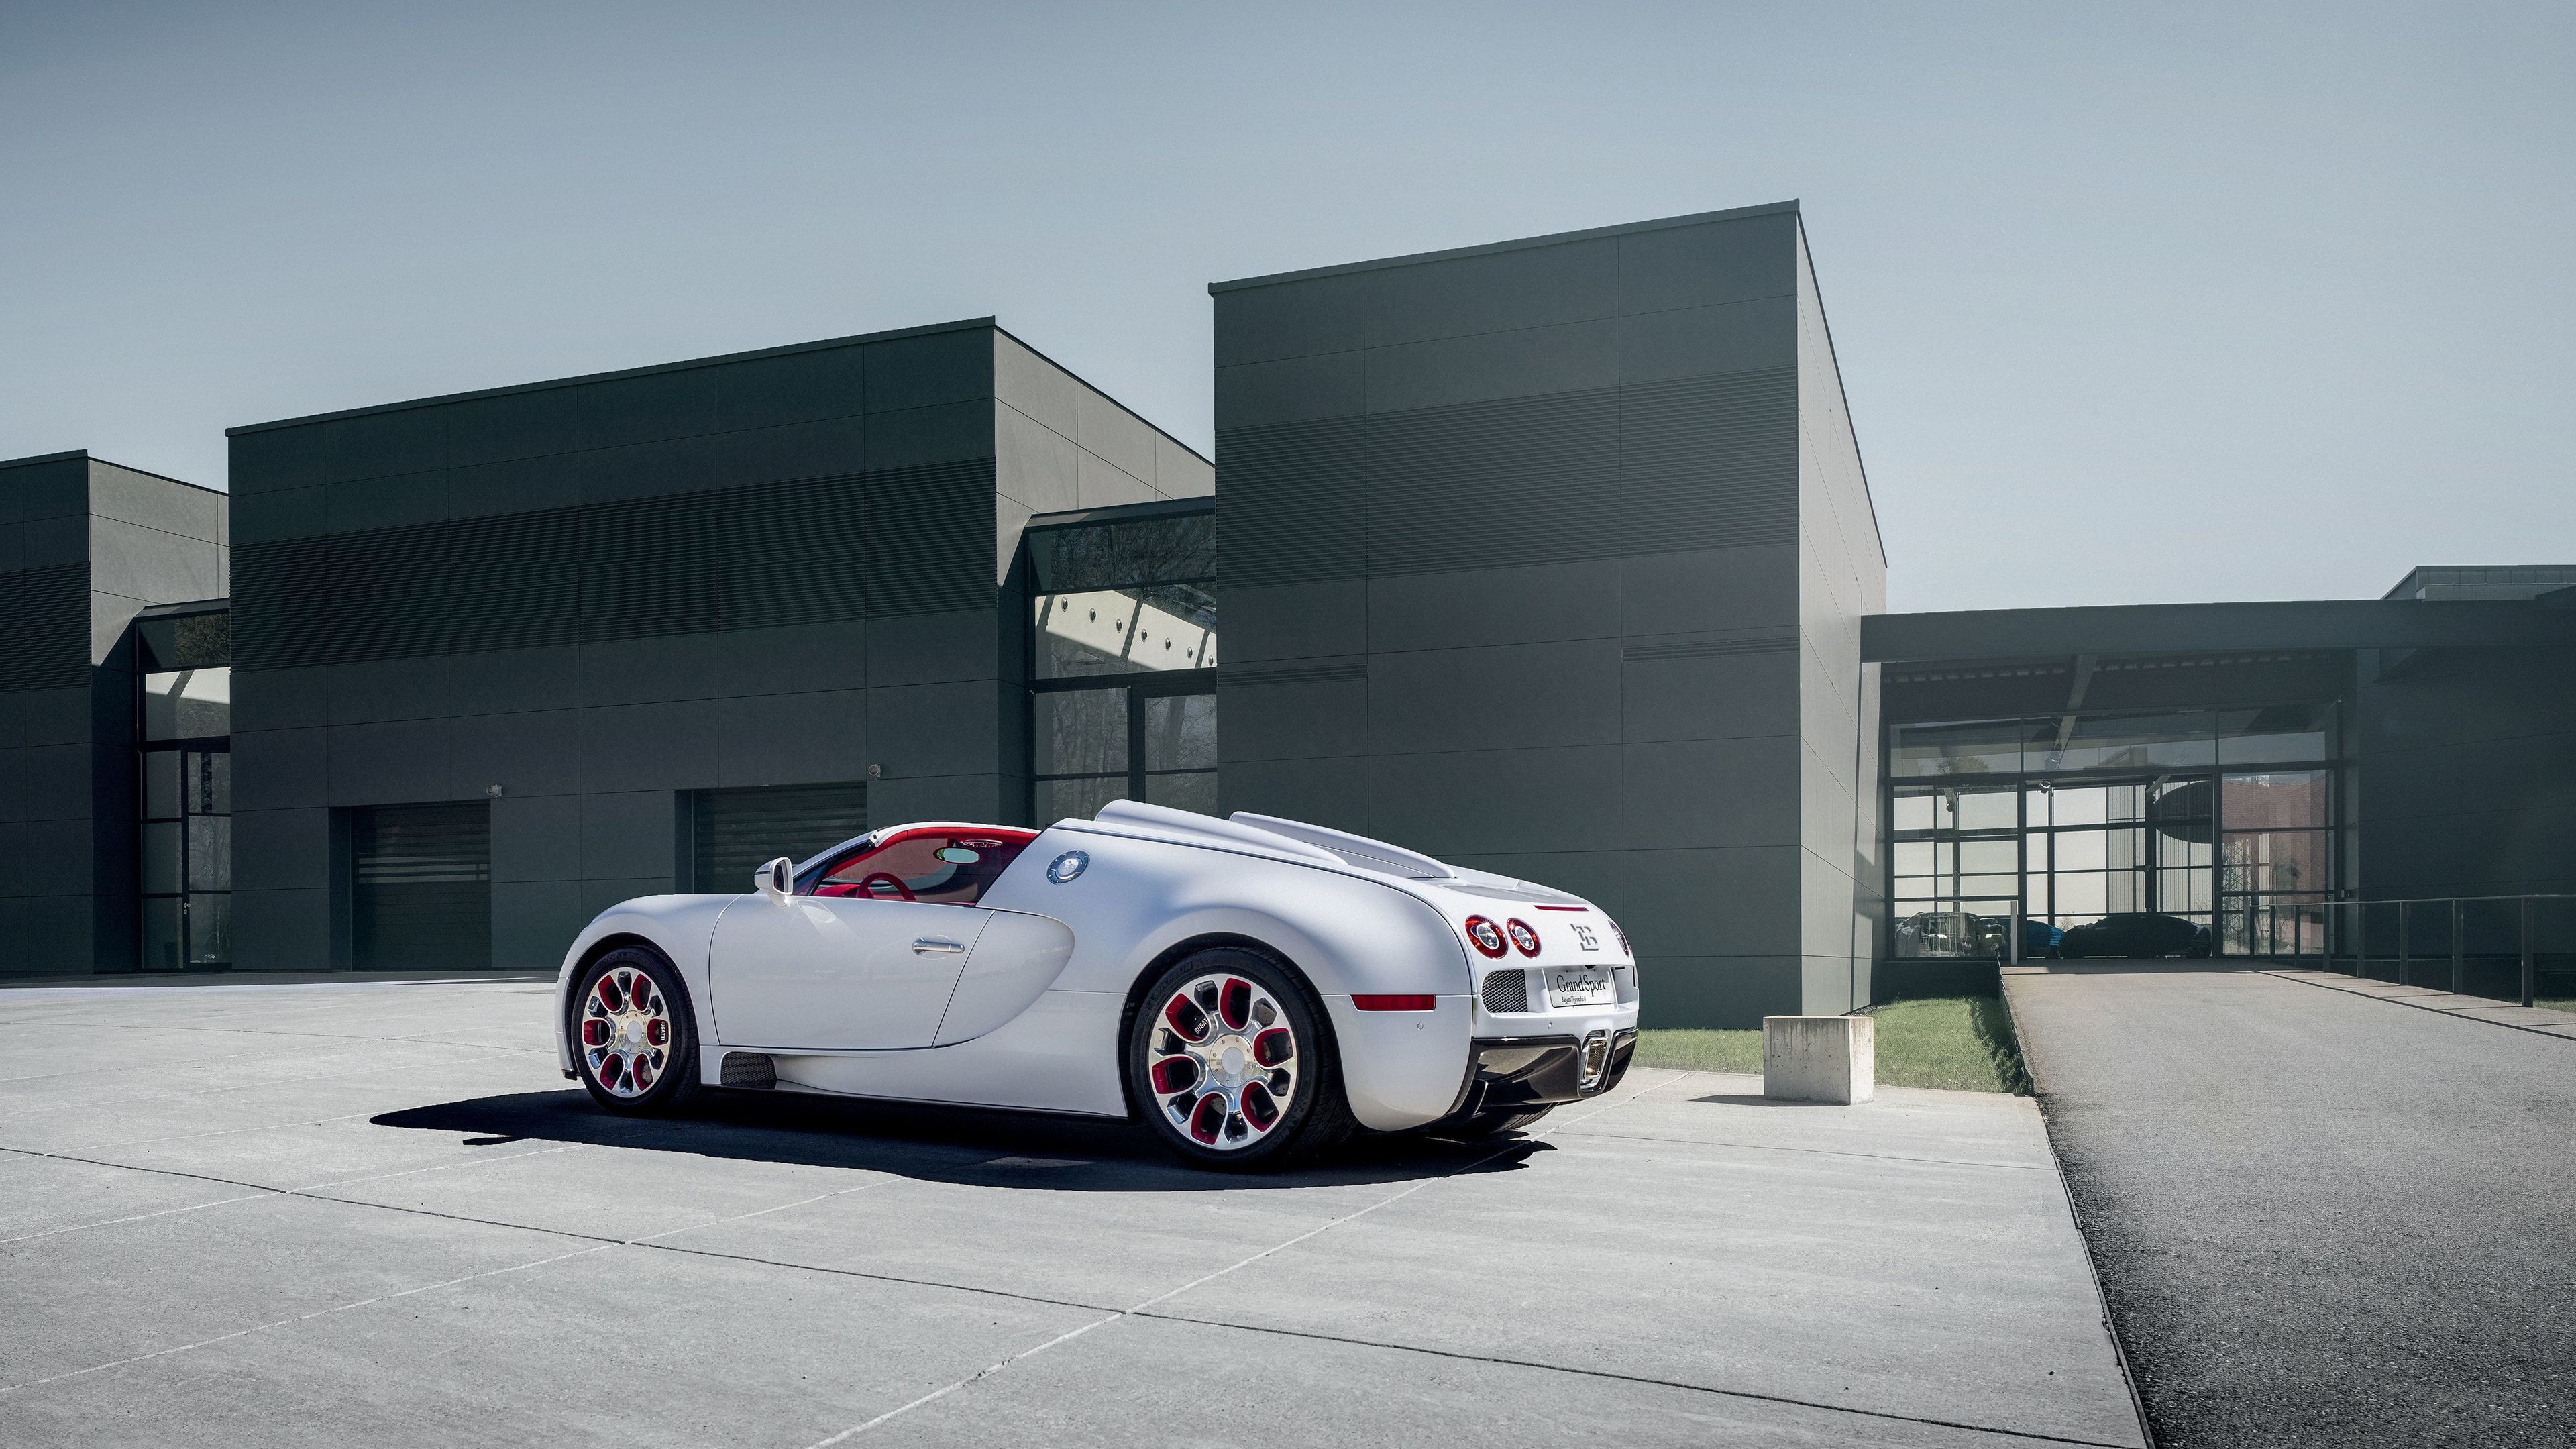 bugatti veyron grand sport vitesse 1541969044 - Bugatti Veyron Grand Sport Vitesse - hd-wallpapers, cars wallpapers, bugatti wallpapers, bugatti veyron wallpapers, 4k-wallpapers